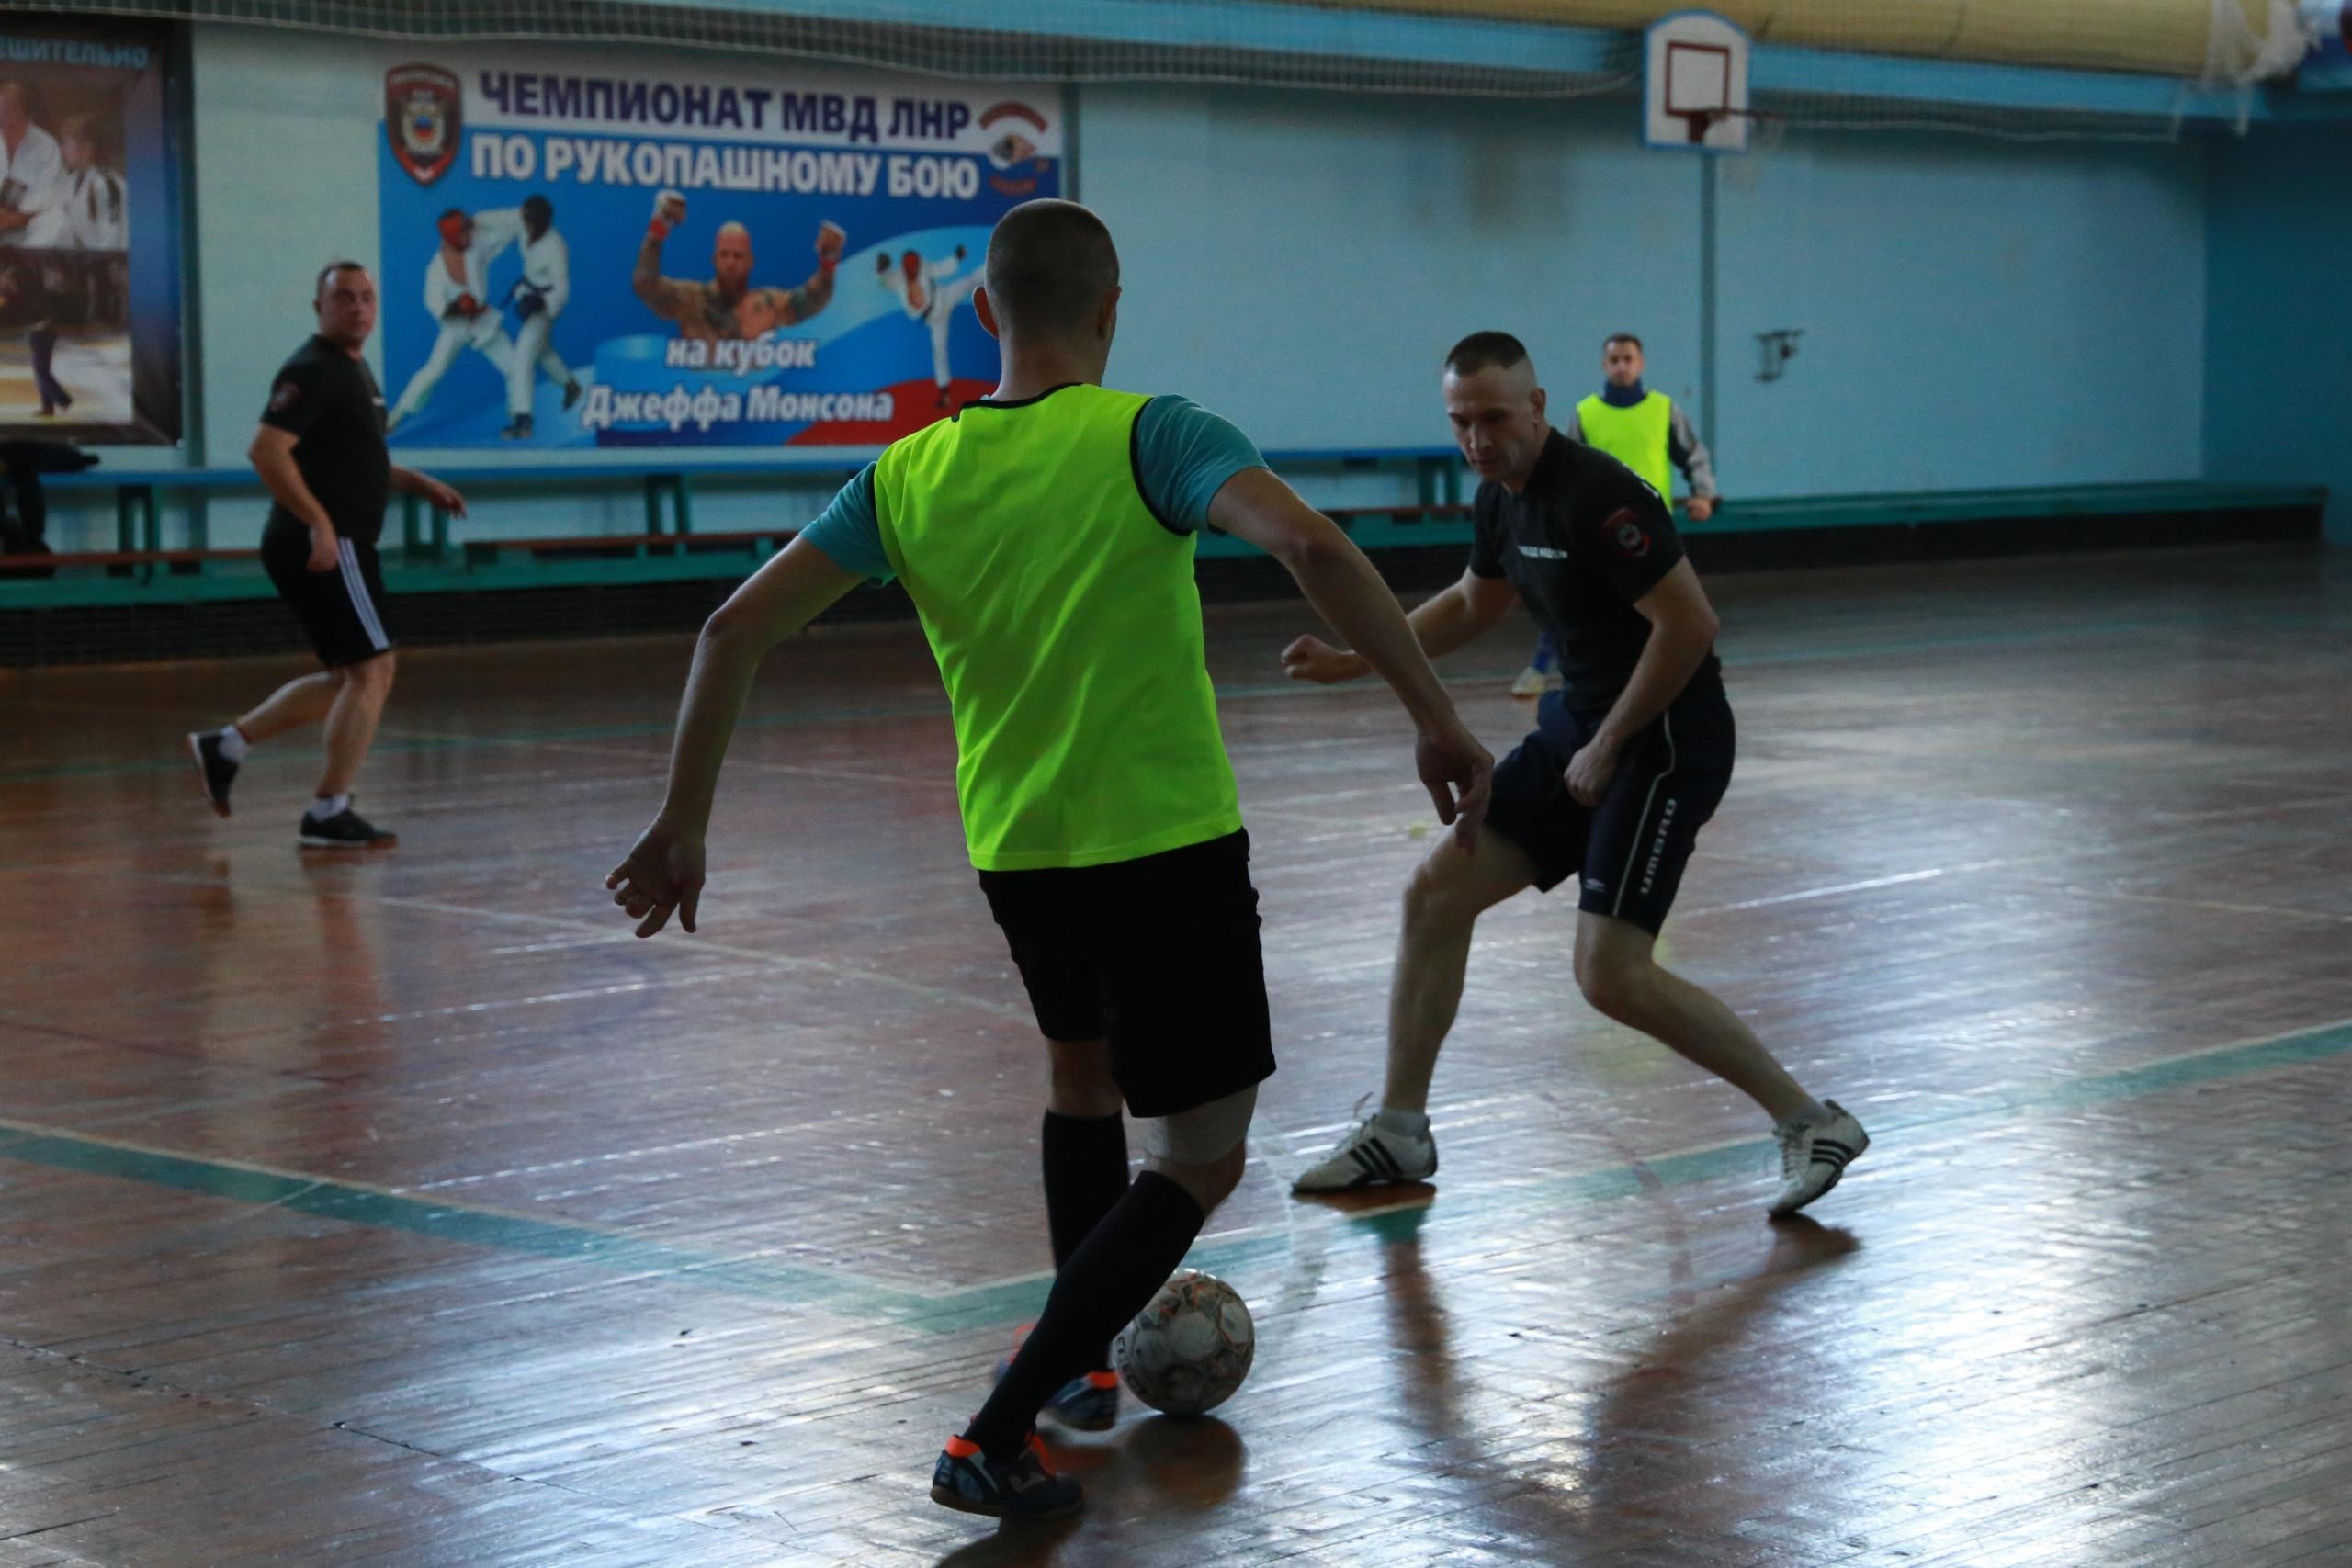 Стартовал Открытый чемпионат РФСО «Динамо» по мини-футболу